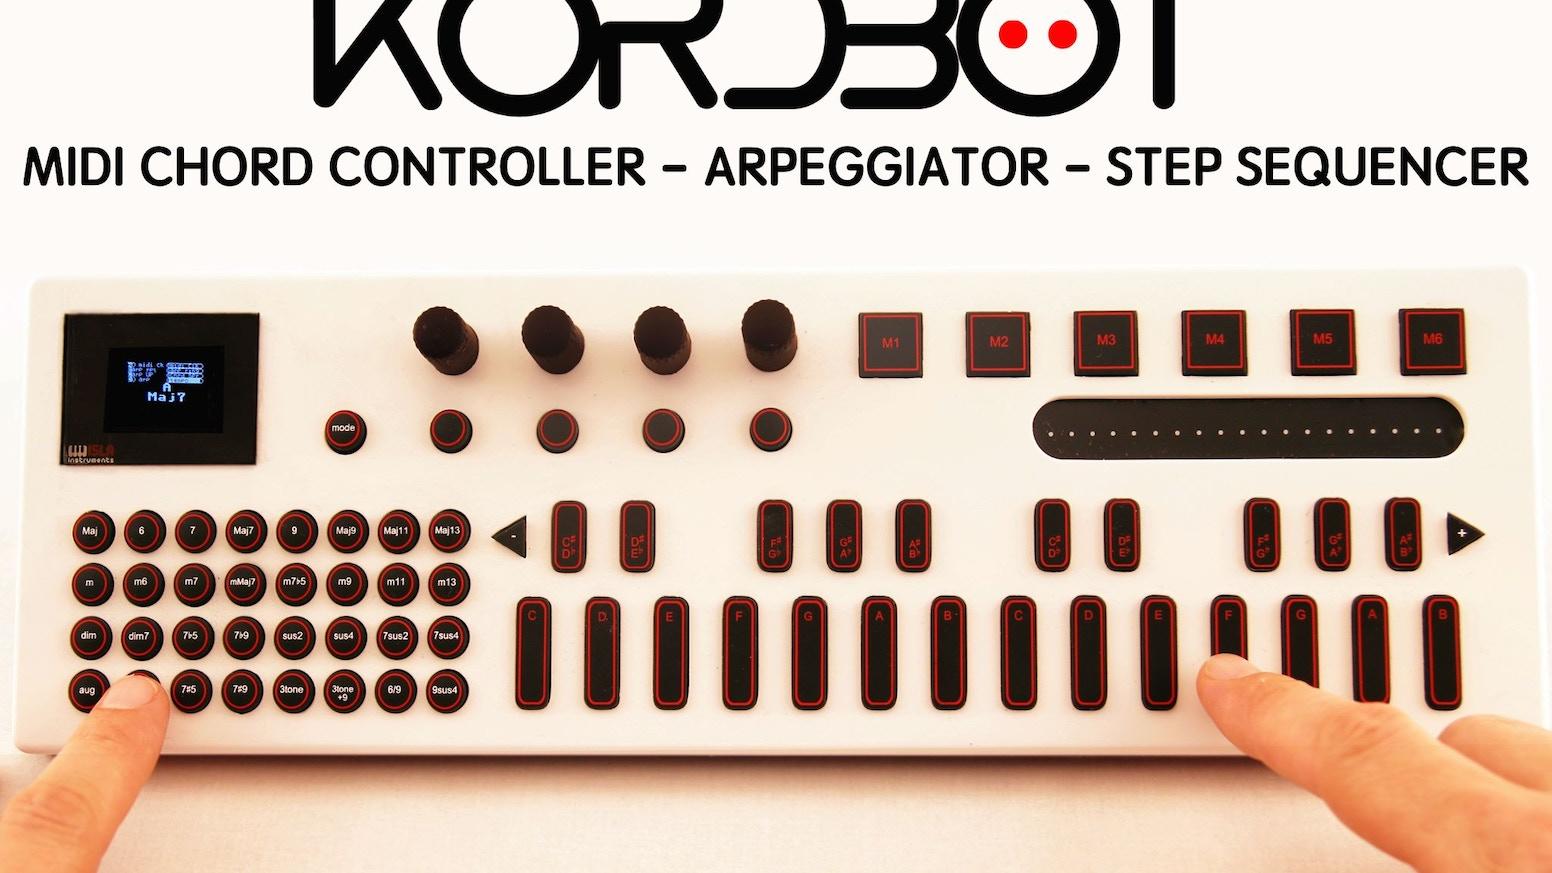 kordbot music production assistant by isla instruments llc kickstarter. Black Bedroom Furniture Sets. Home Design Ideas